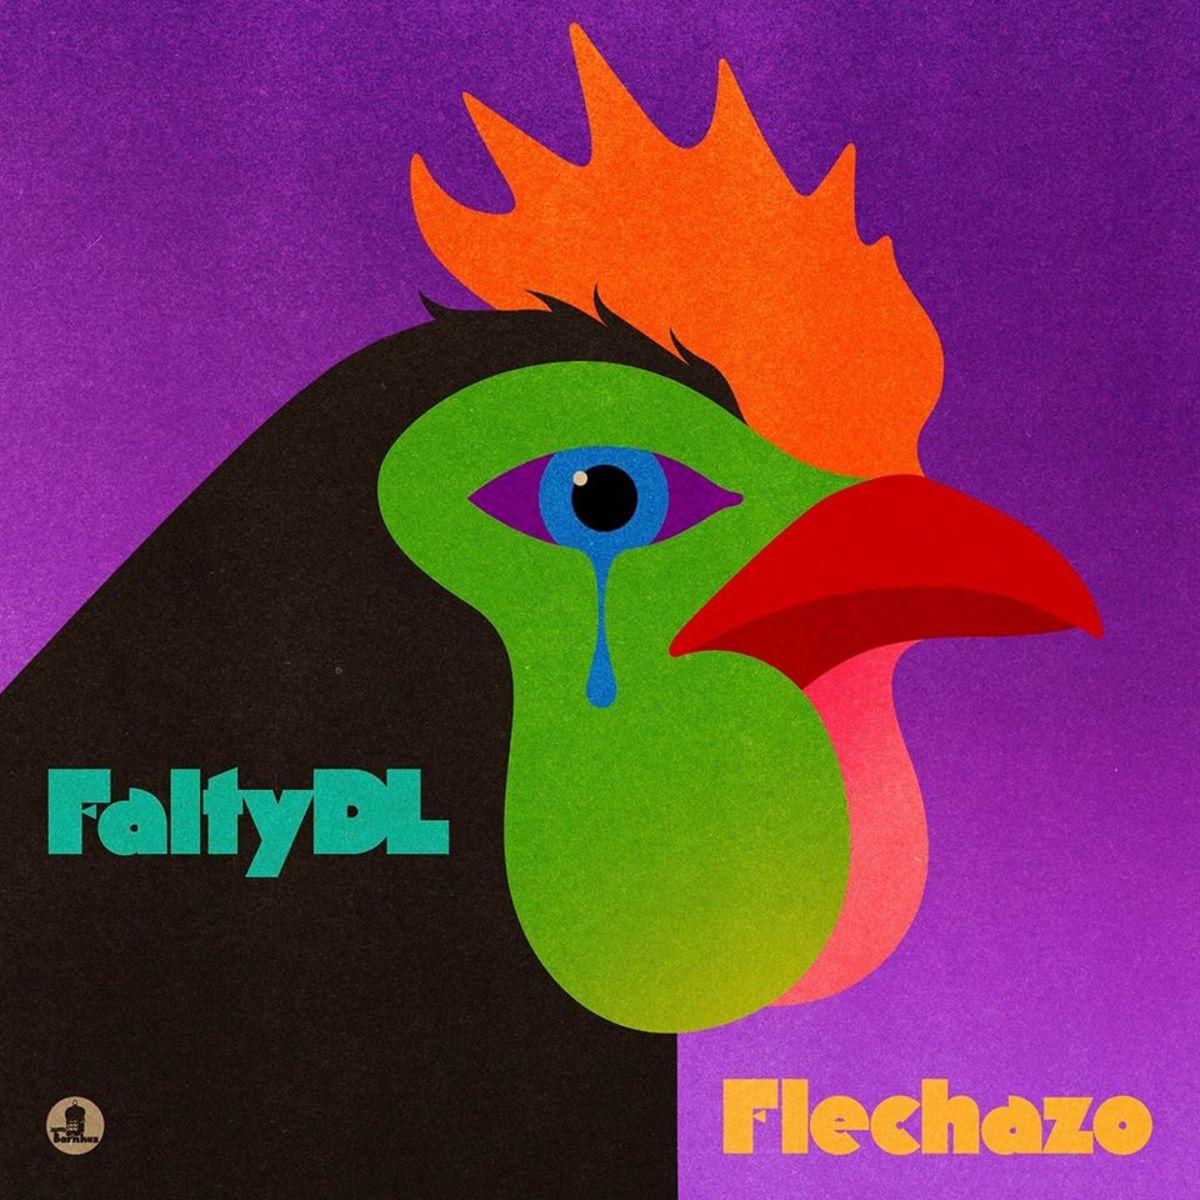 FaltyDL Flechazo EP